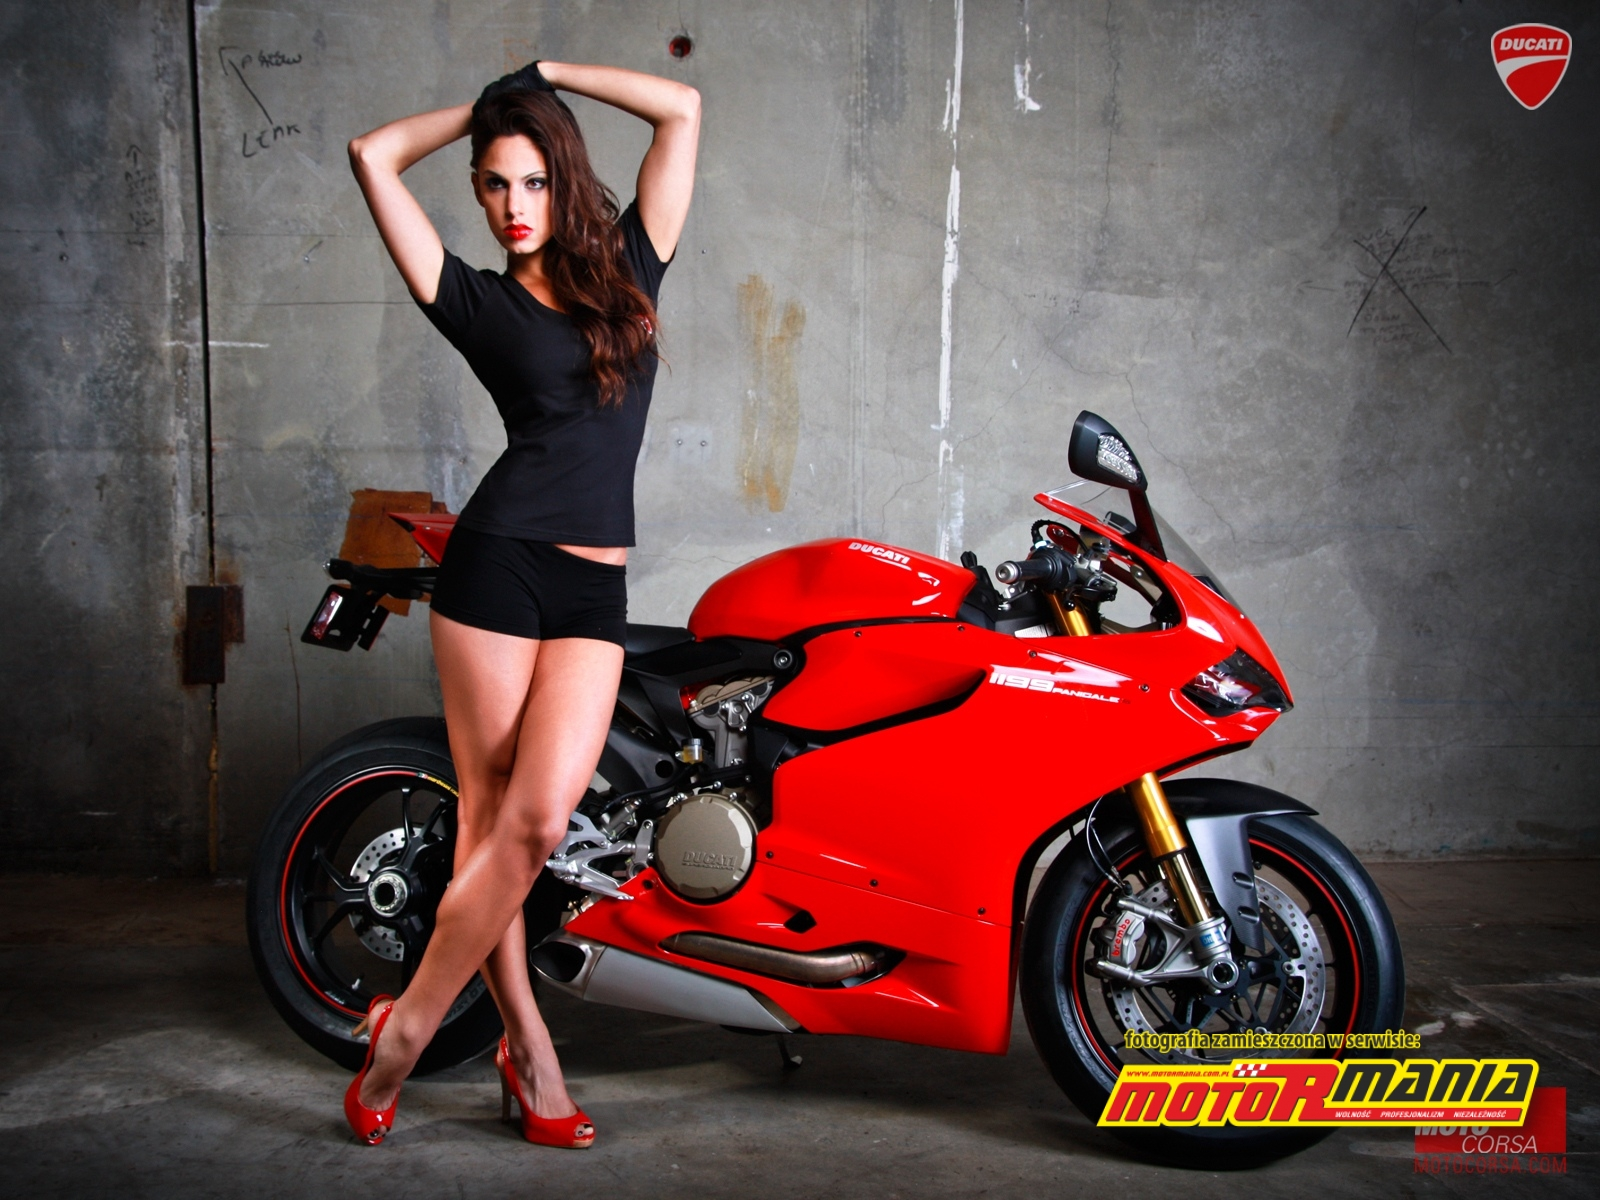 Piekny motocykl i modelka